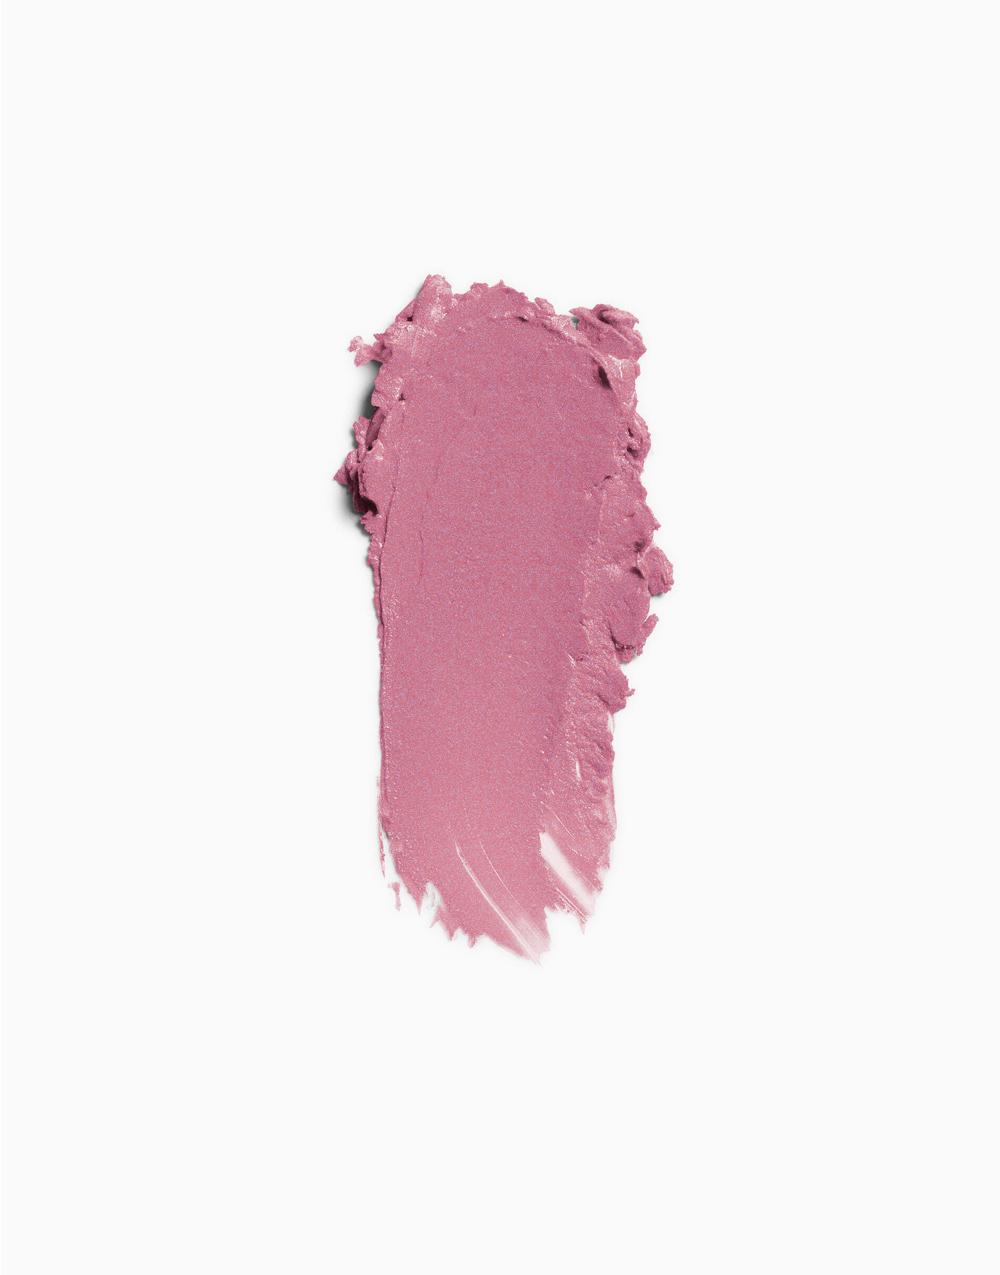 Exhibitionist Cream Lipstick by CoverGirl   Romance Mauve